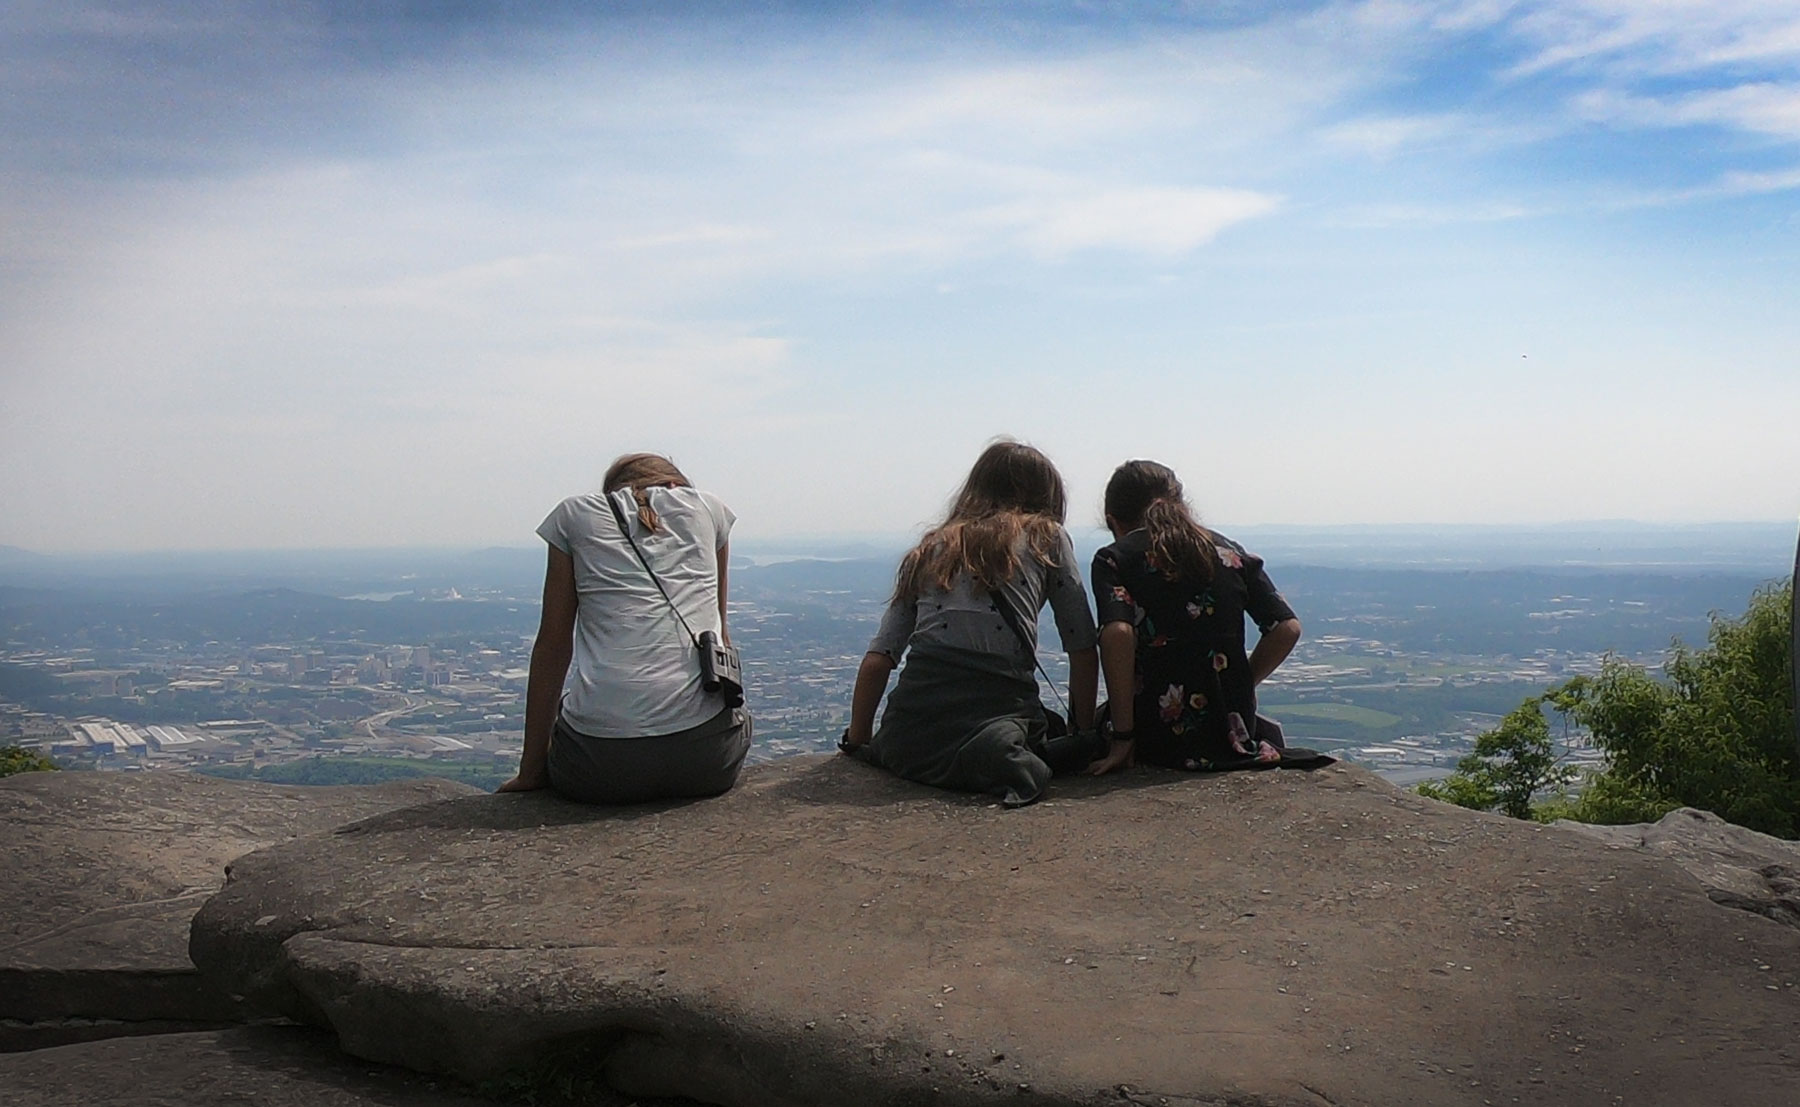 Three girls on Lookout Mountain Overlook at Chattanooga Battlefield, Tennessee